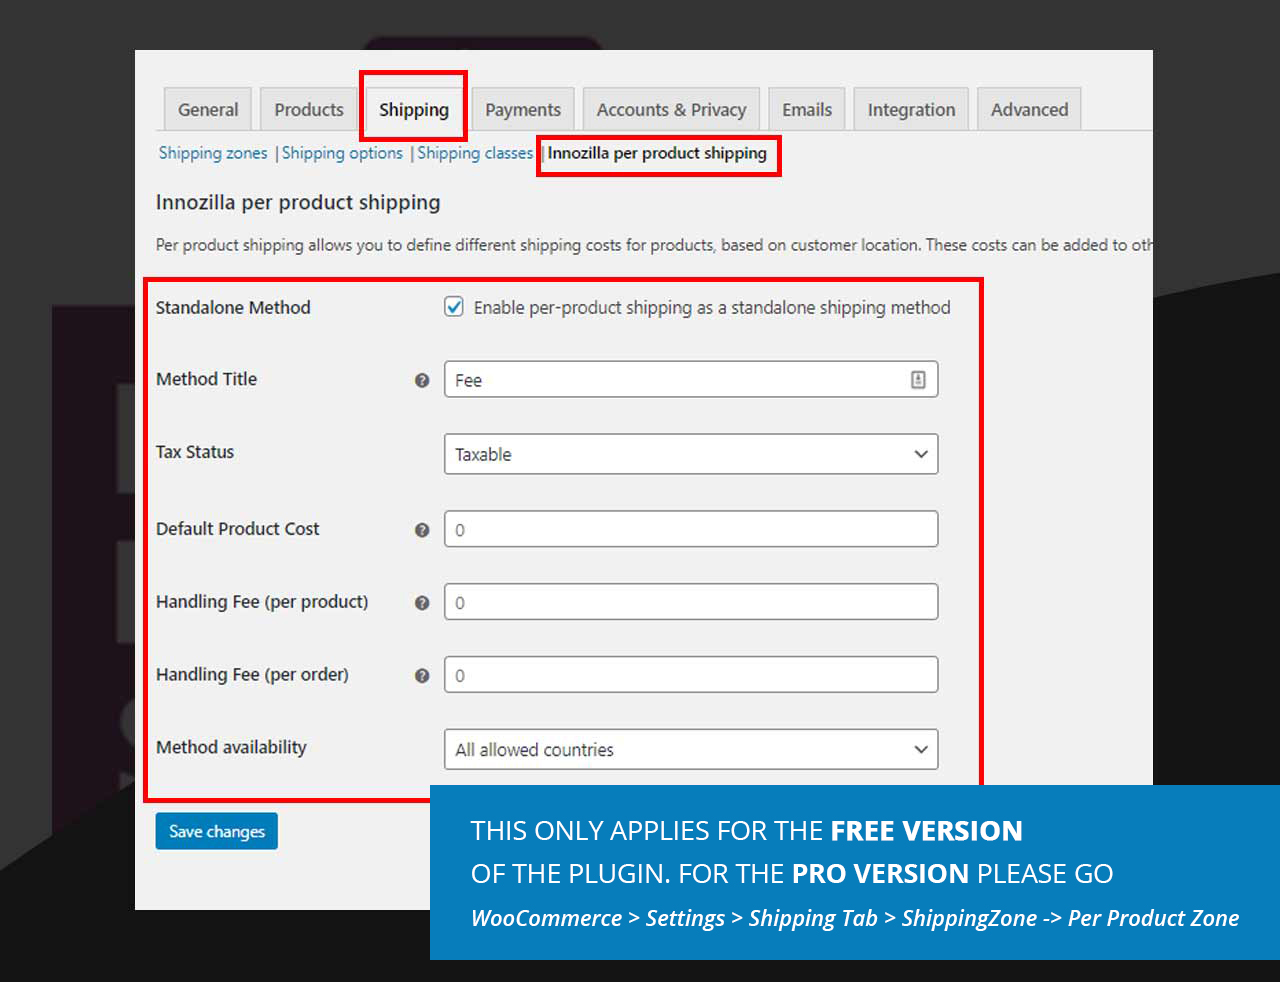 Global Settings - Settings->Shipping Tab->Innozilla per product shipping Tab